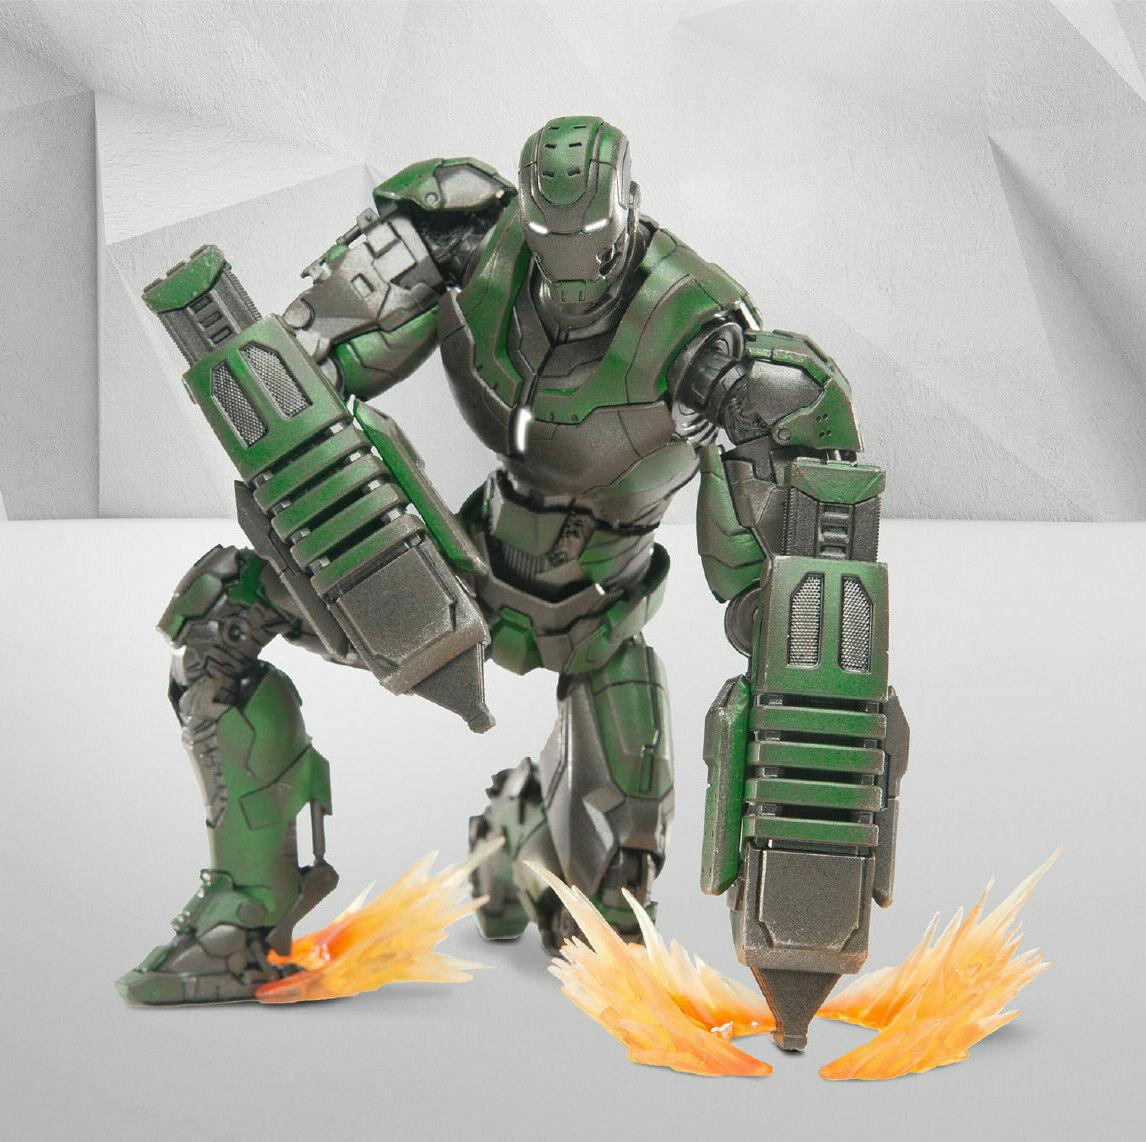 Comicave Studios 1 12 Diecast Iron Man MK26 Gamma Figura de Acción Juguetes Coleccionables